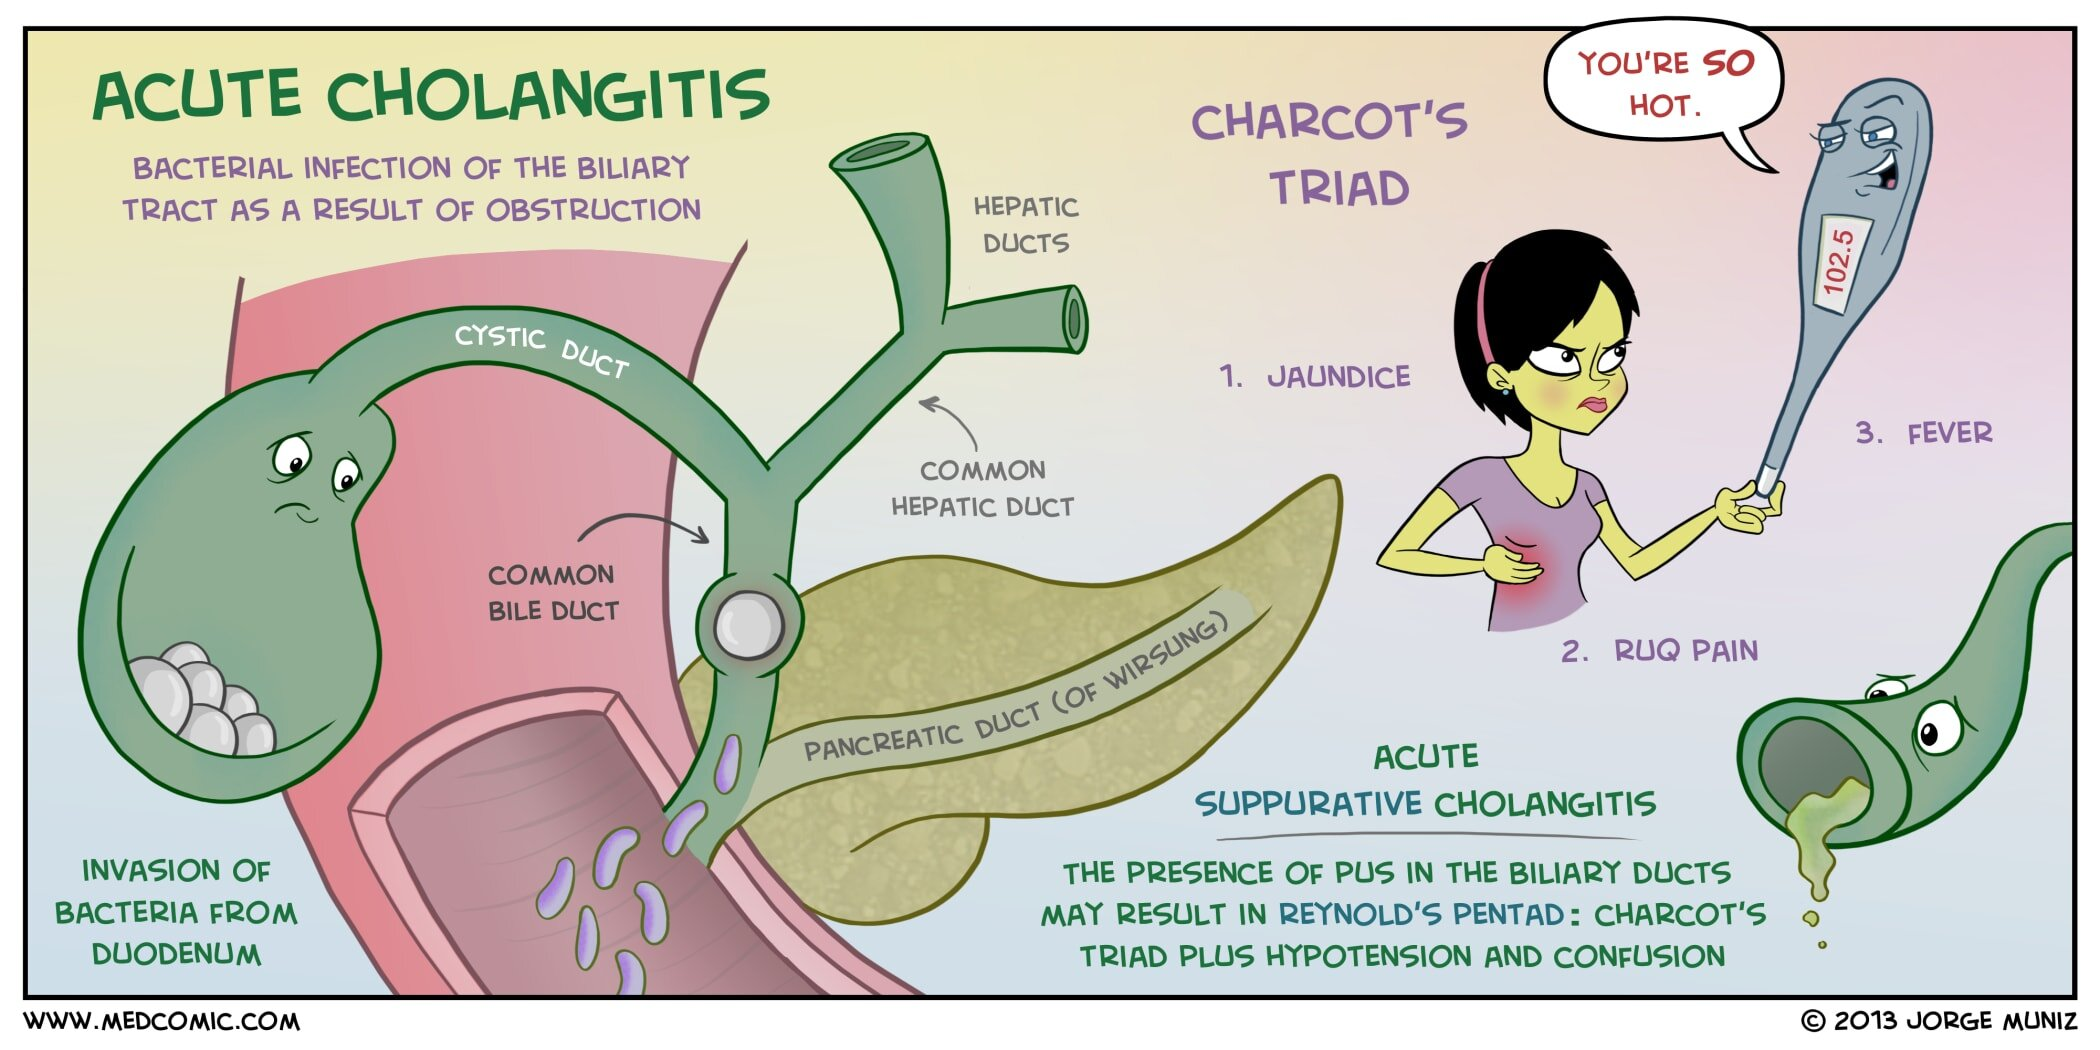 Acute Cholangitis — Medcomic